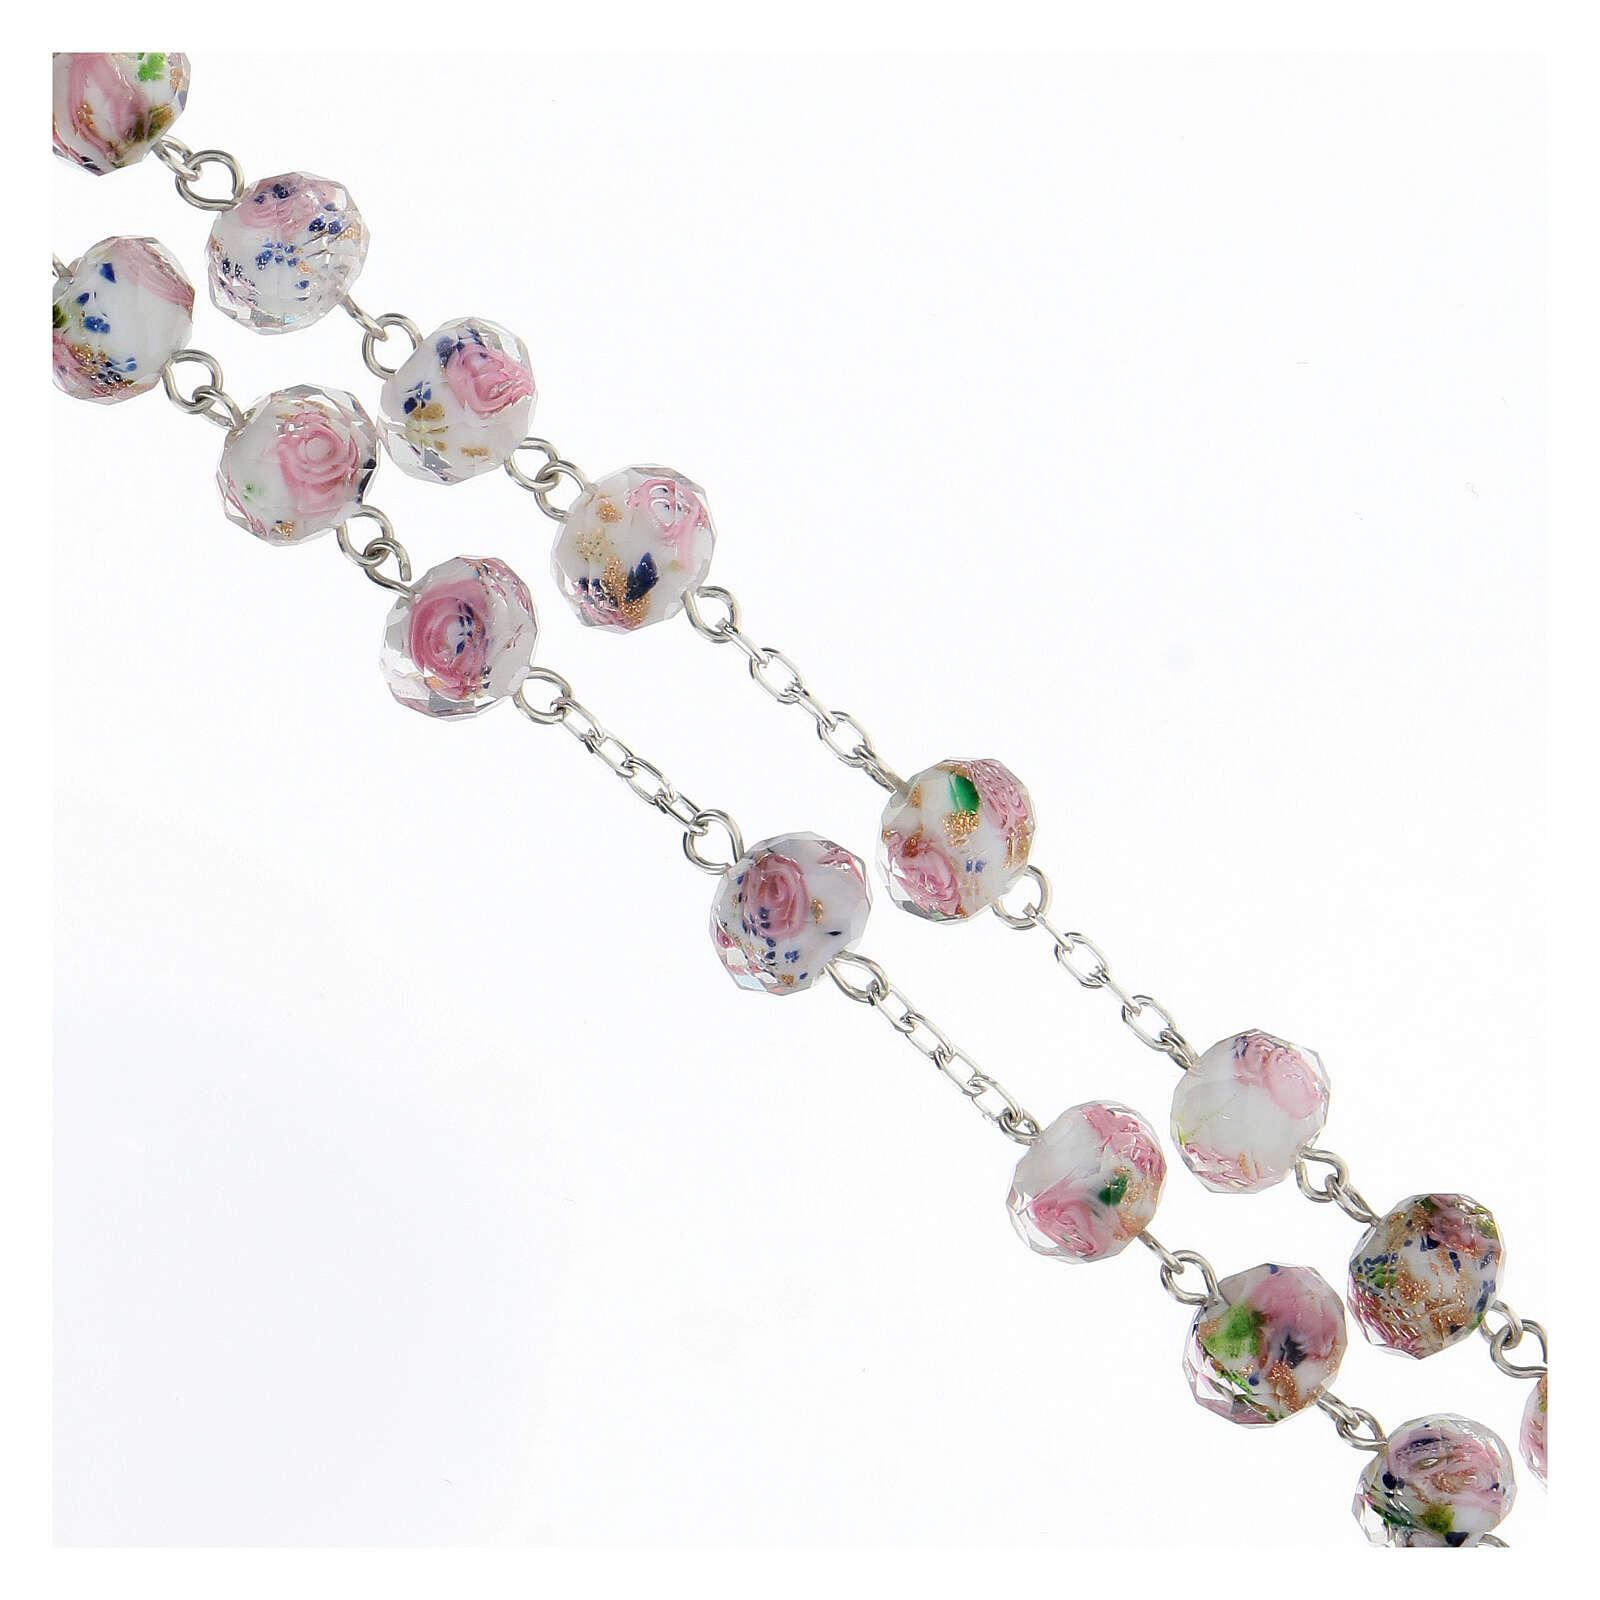 Terço prata 925 contas vidro multifacetado 8x10 mm branco com rosas 4